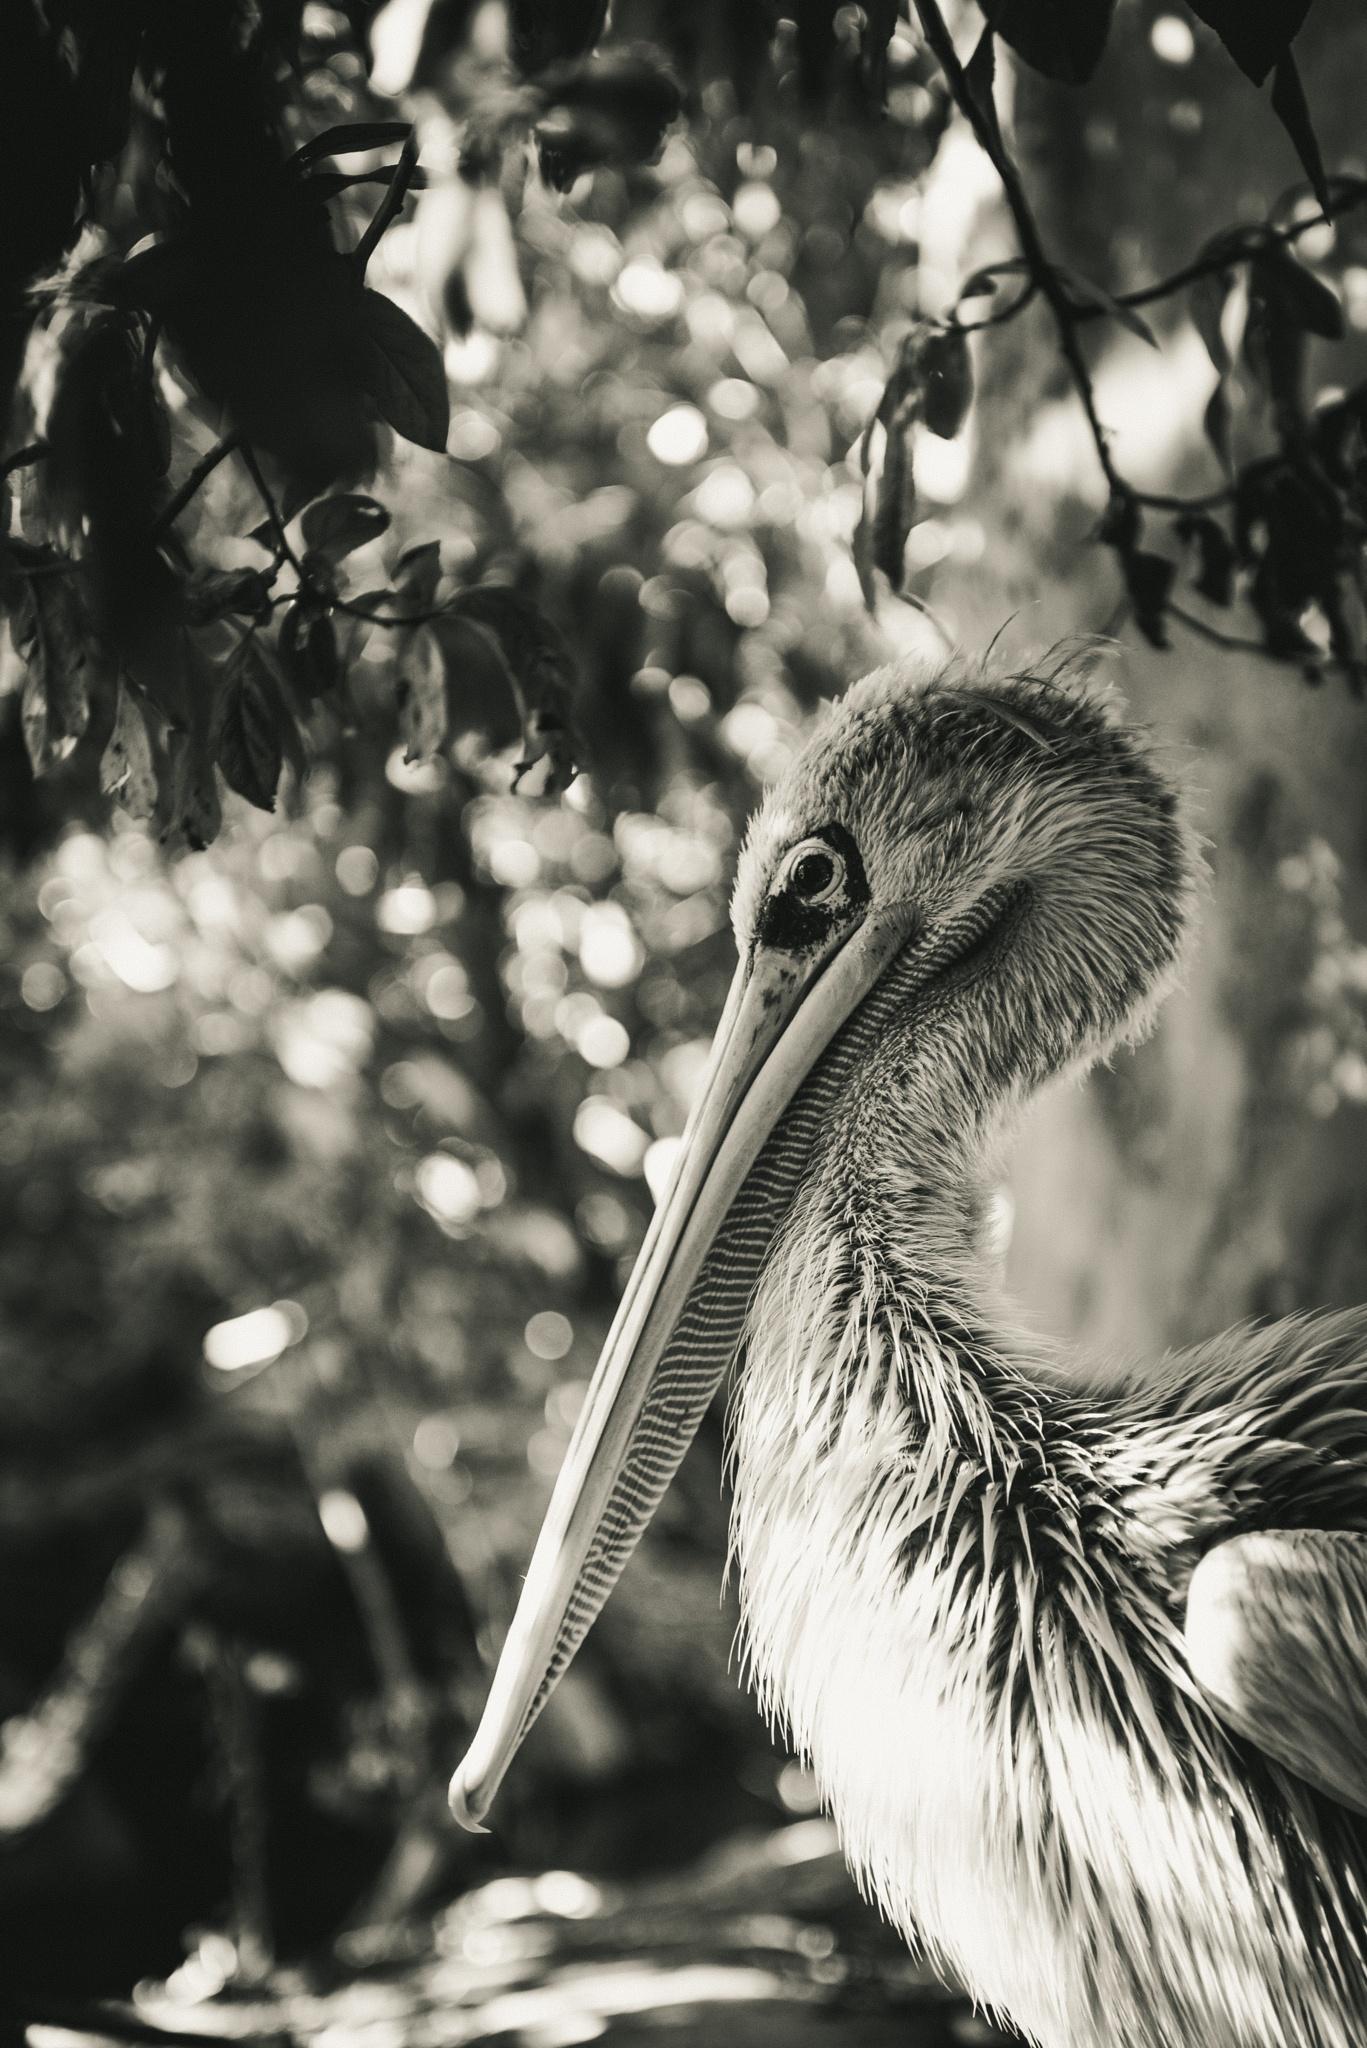 Bird in profile by Marie N